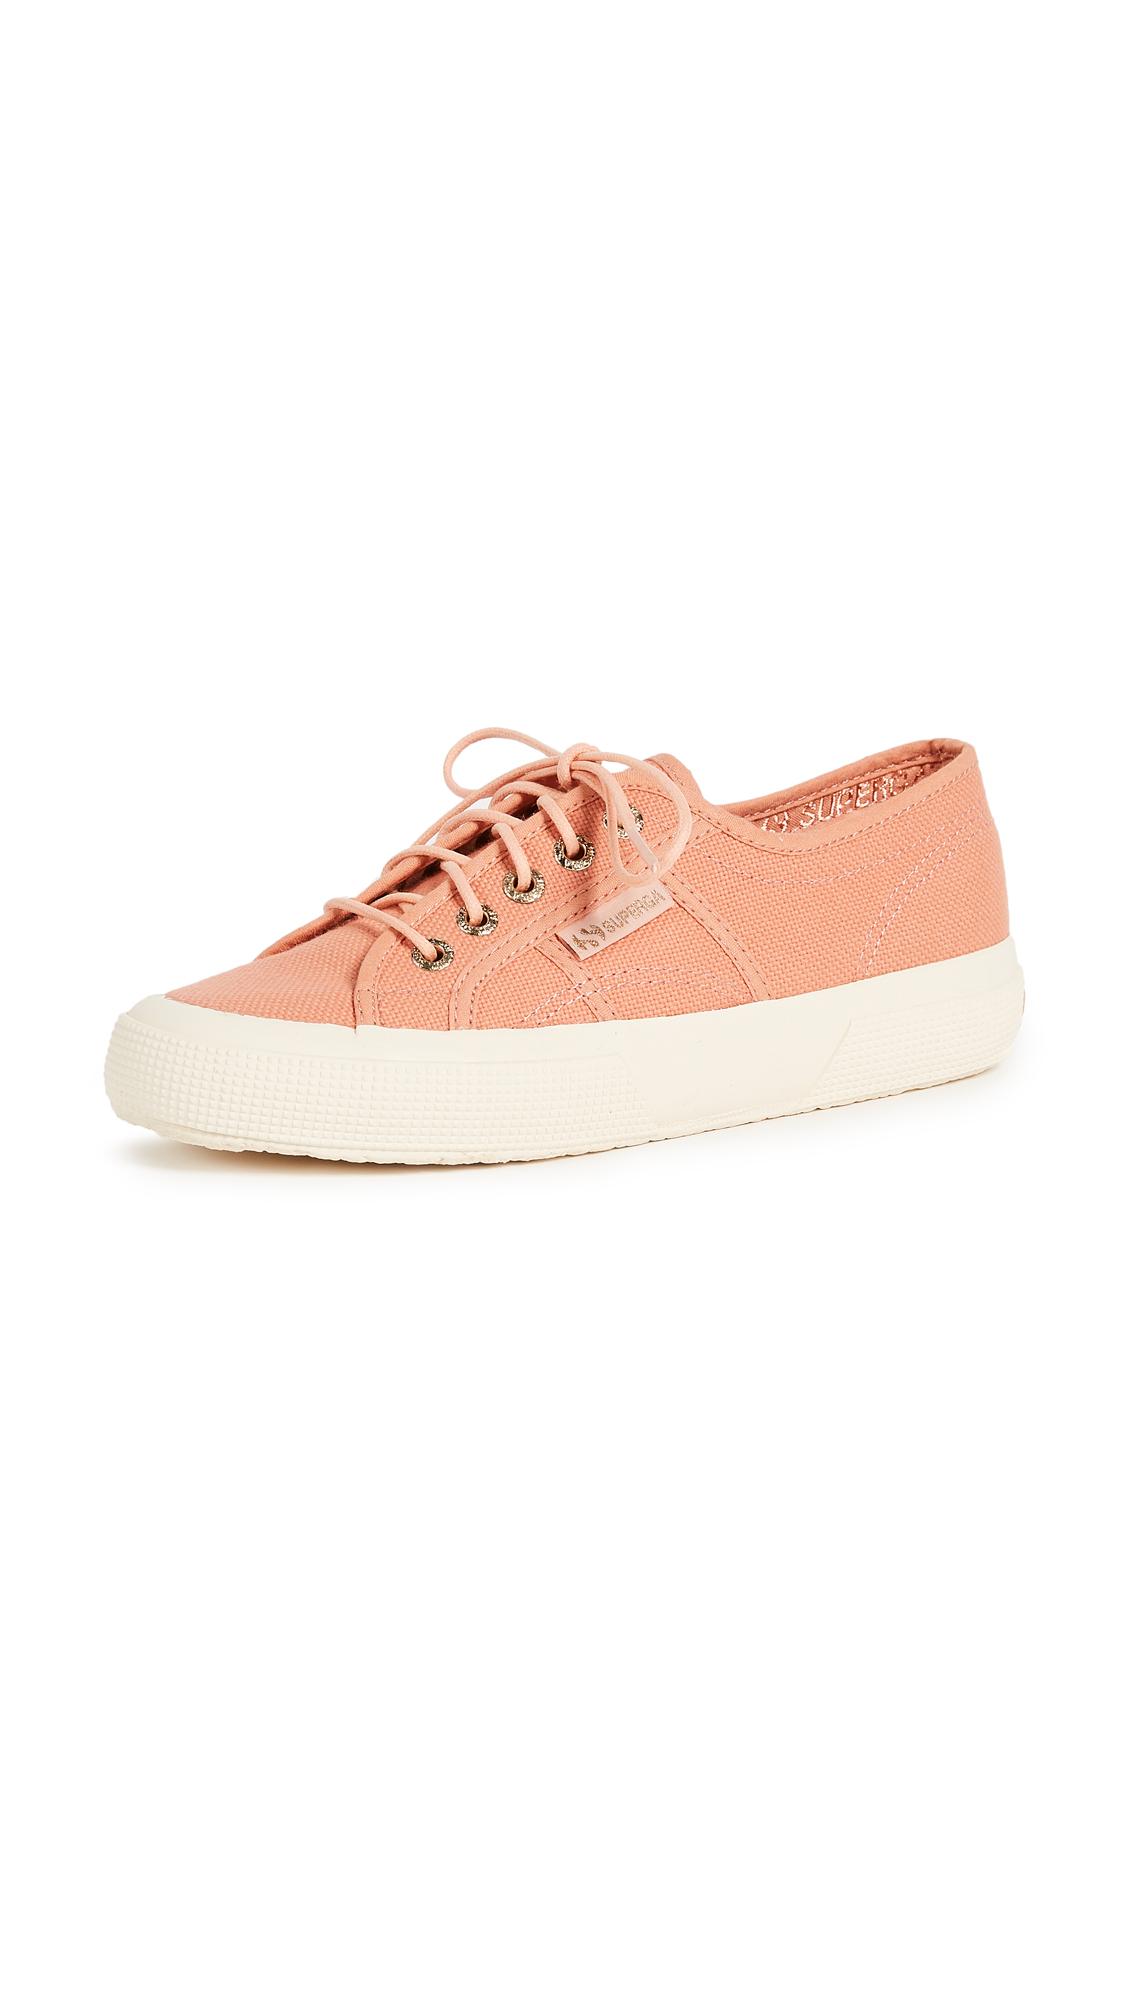 Superga 2750 Sant Ambroeus Laceup Sneakers